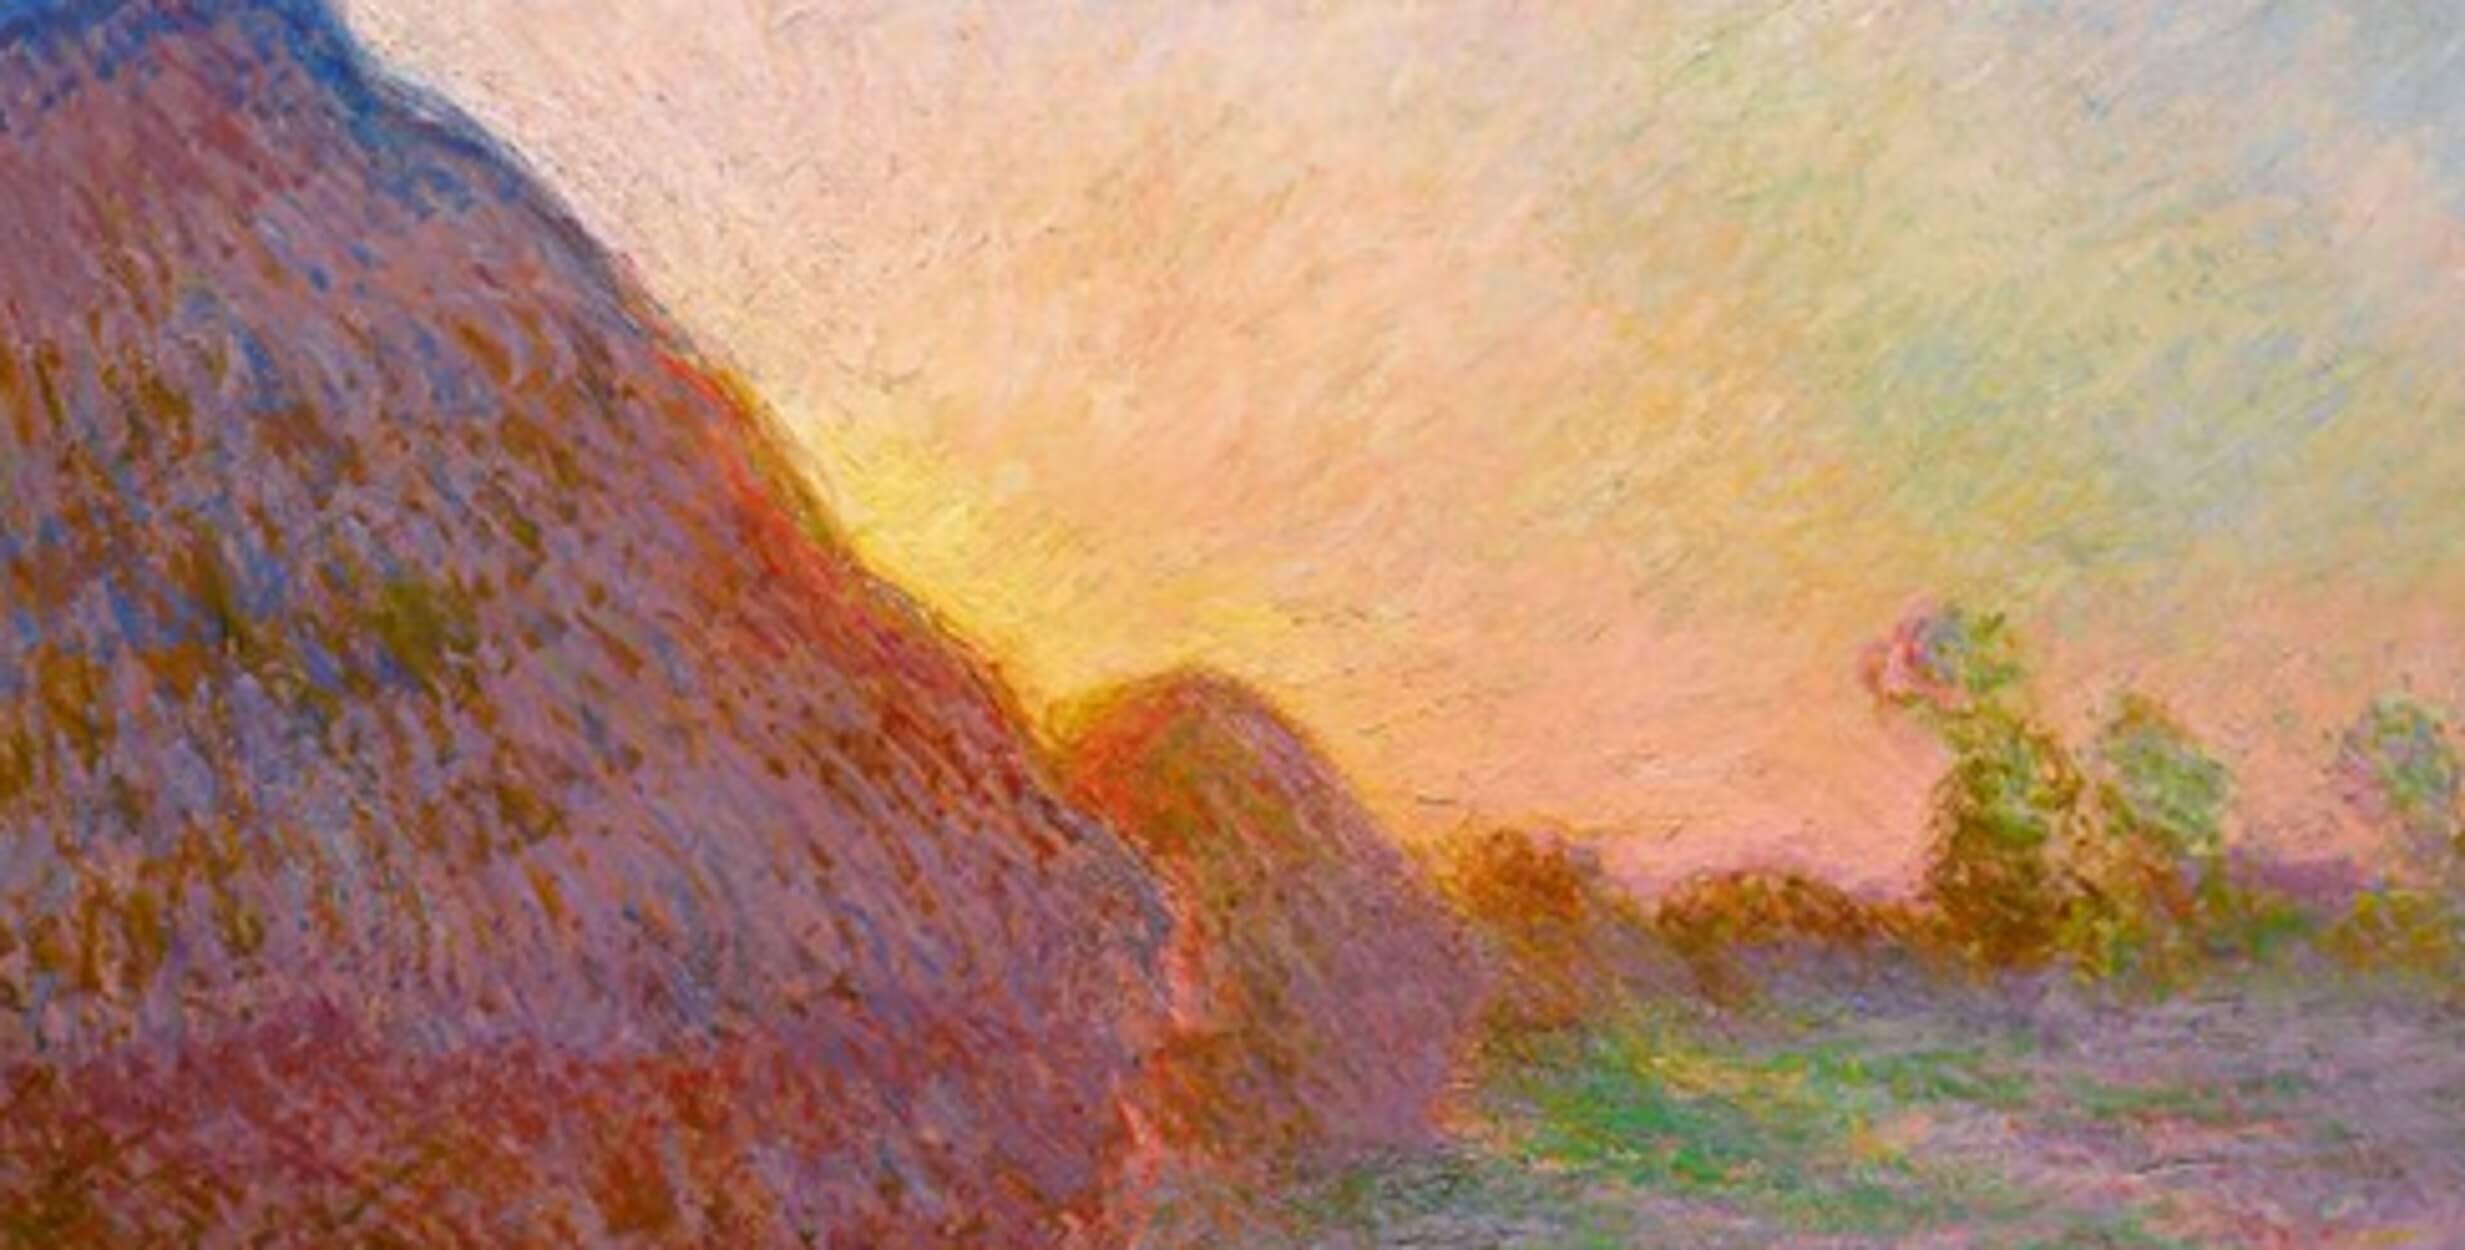 Sotheby's: Πίνακας του Μονέ πωλήθηκε σε τιμή ρεκόρ!